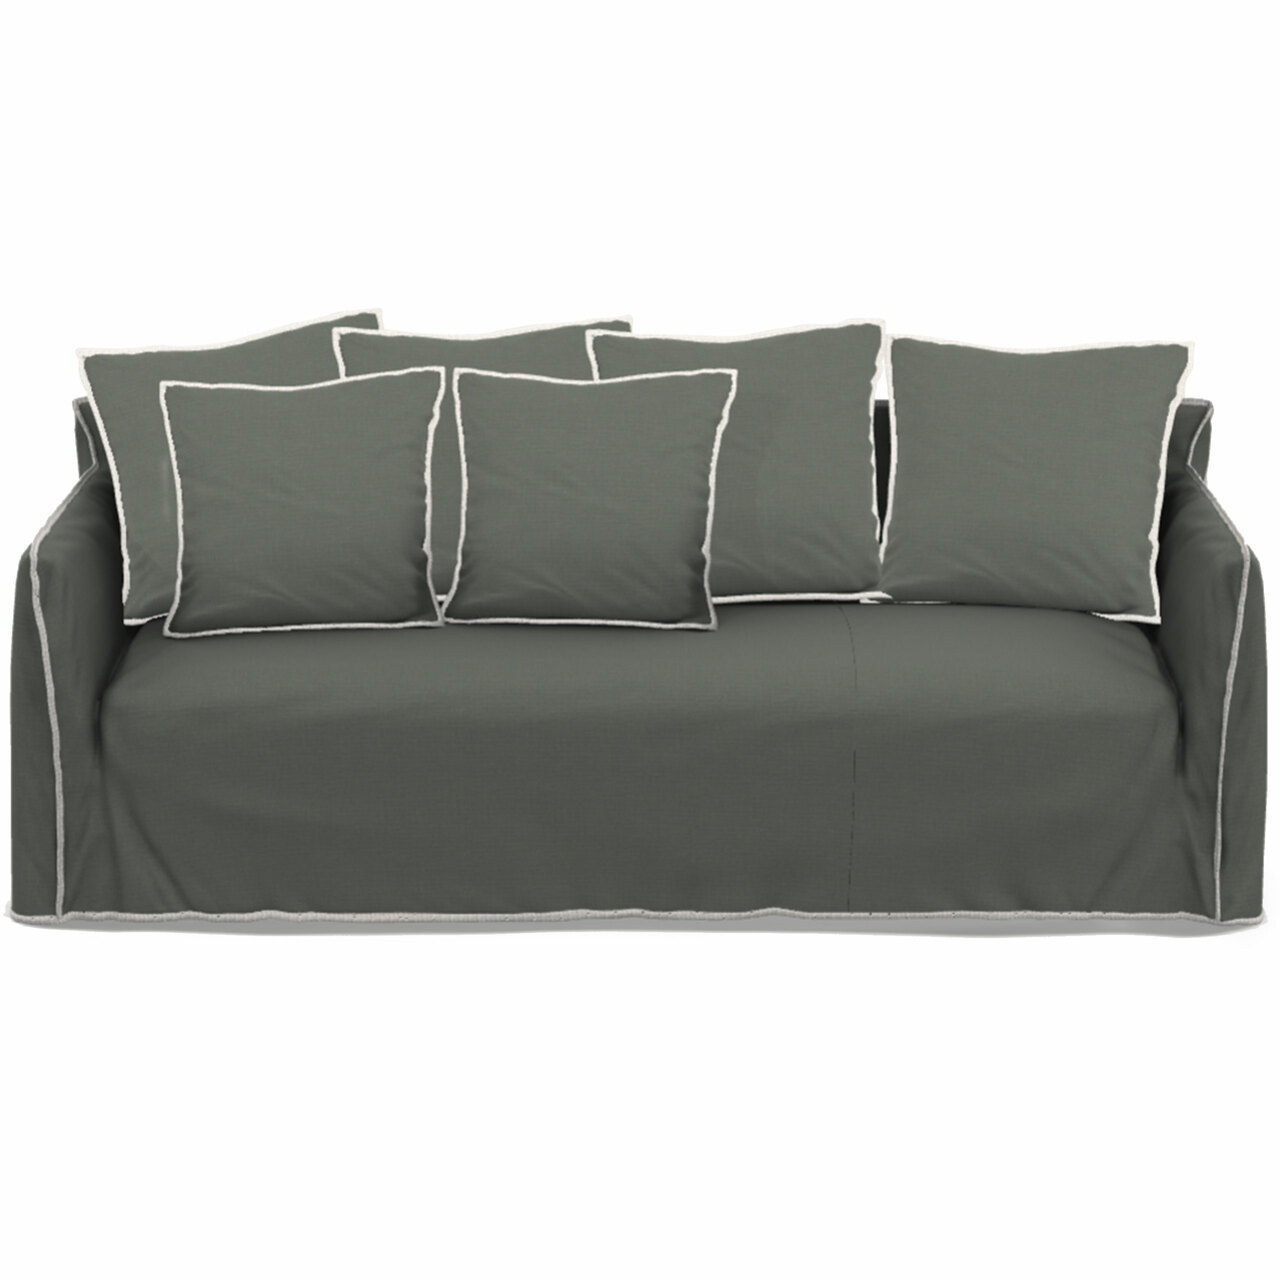 Gervasoni Sofa 'Ghost' B: 260 cm / T: 100 cm , Grafite - Furby